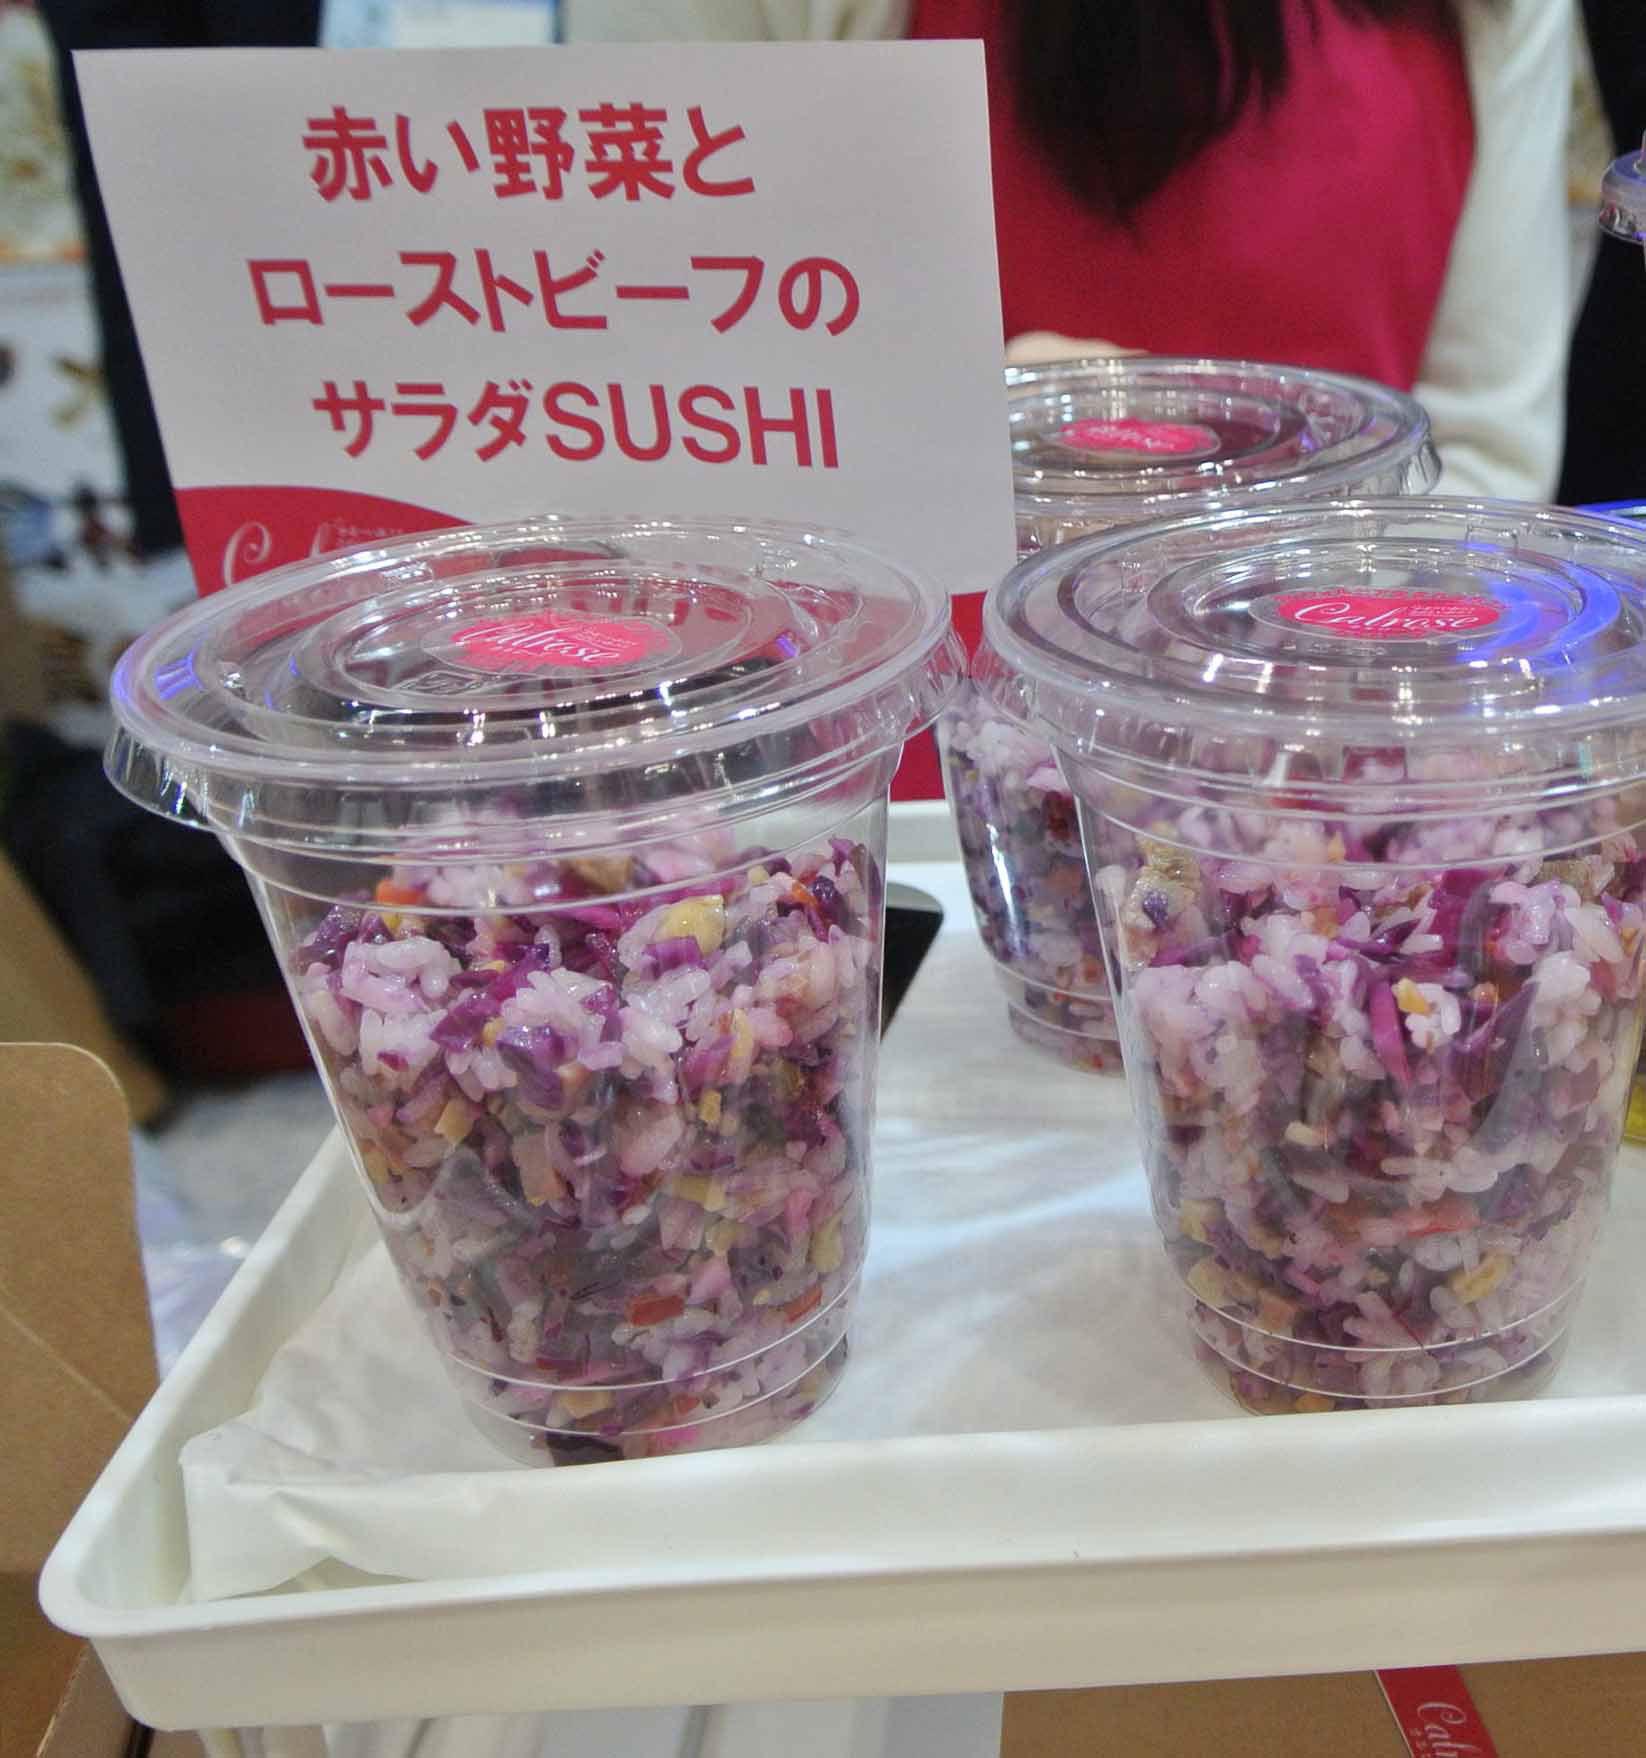 IP.w-Medium-Grain-Featured-at-Foodex-Japan,-Sushi-Salad-170310